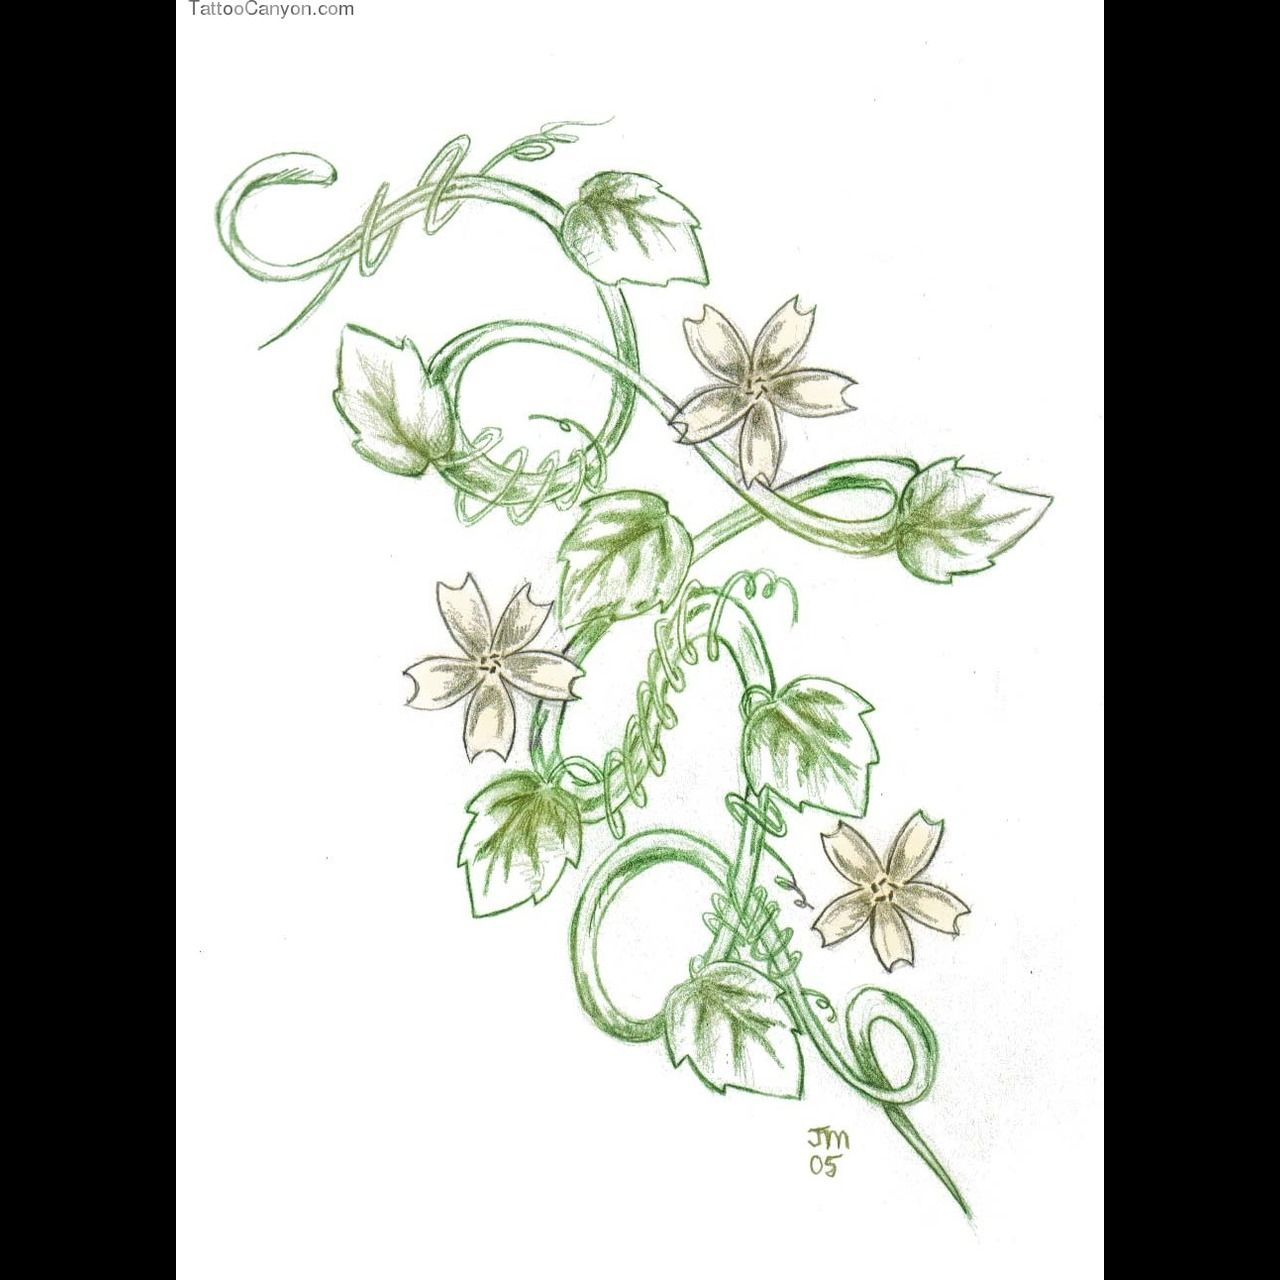 17497 vine tattoos flower rose tribal tattoo art free download 17497 vine tattoos flower rose tribal tattoo art izmirmasajfo Images